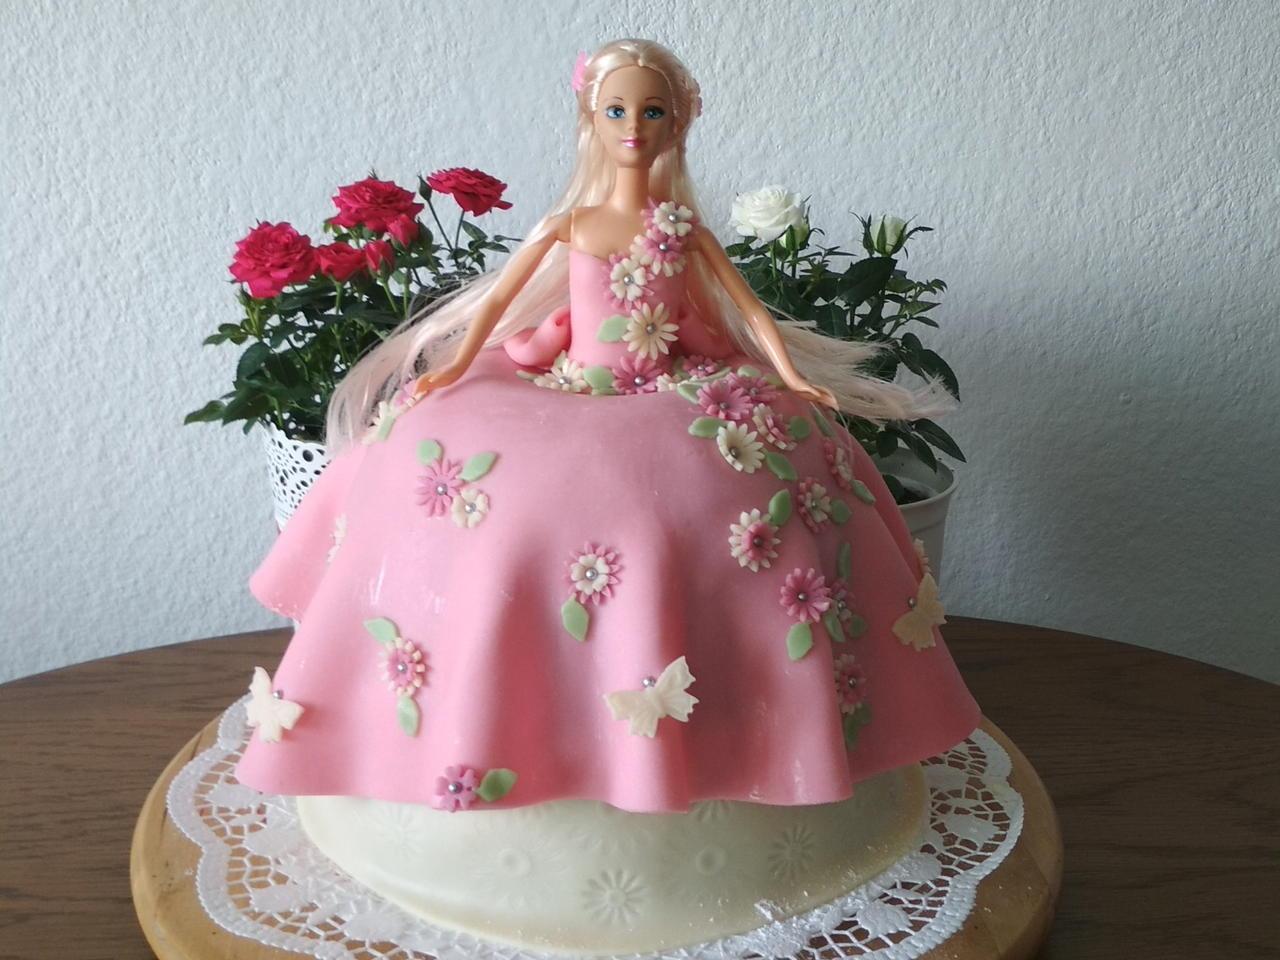 Výsledek obrázku pro dort s panenkou ke 3.